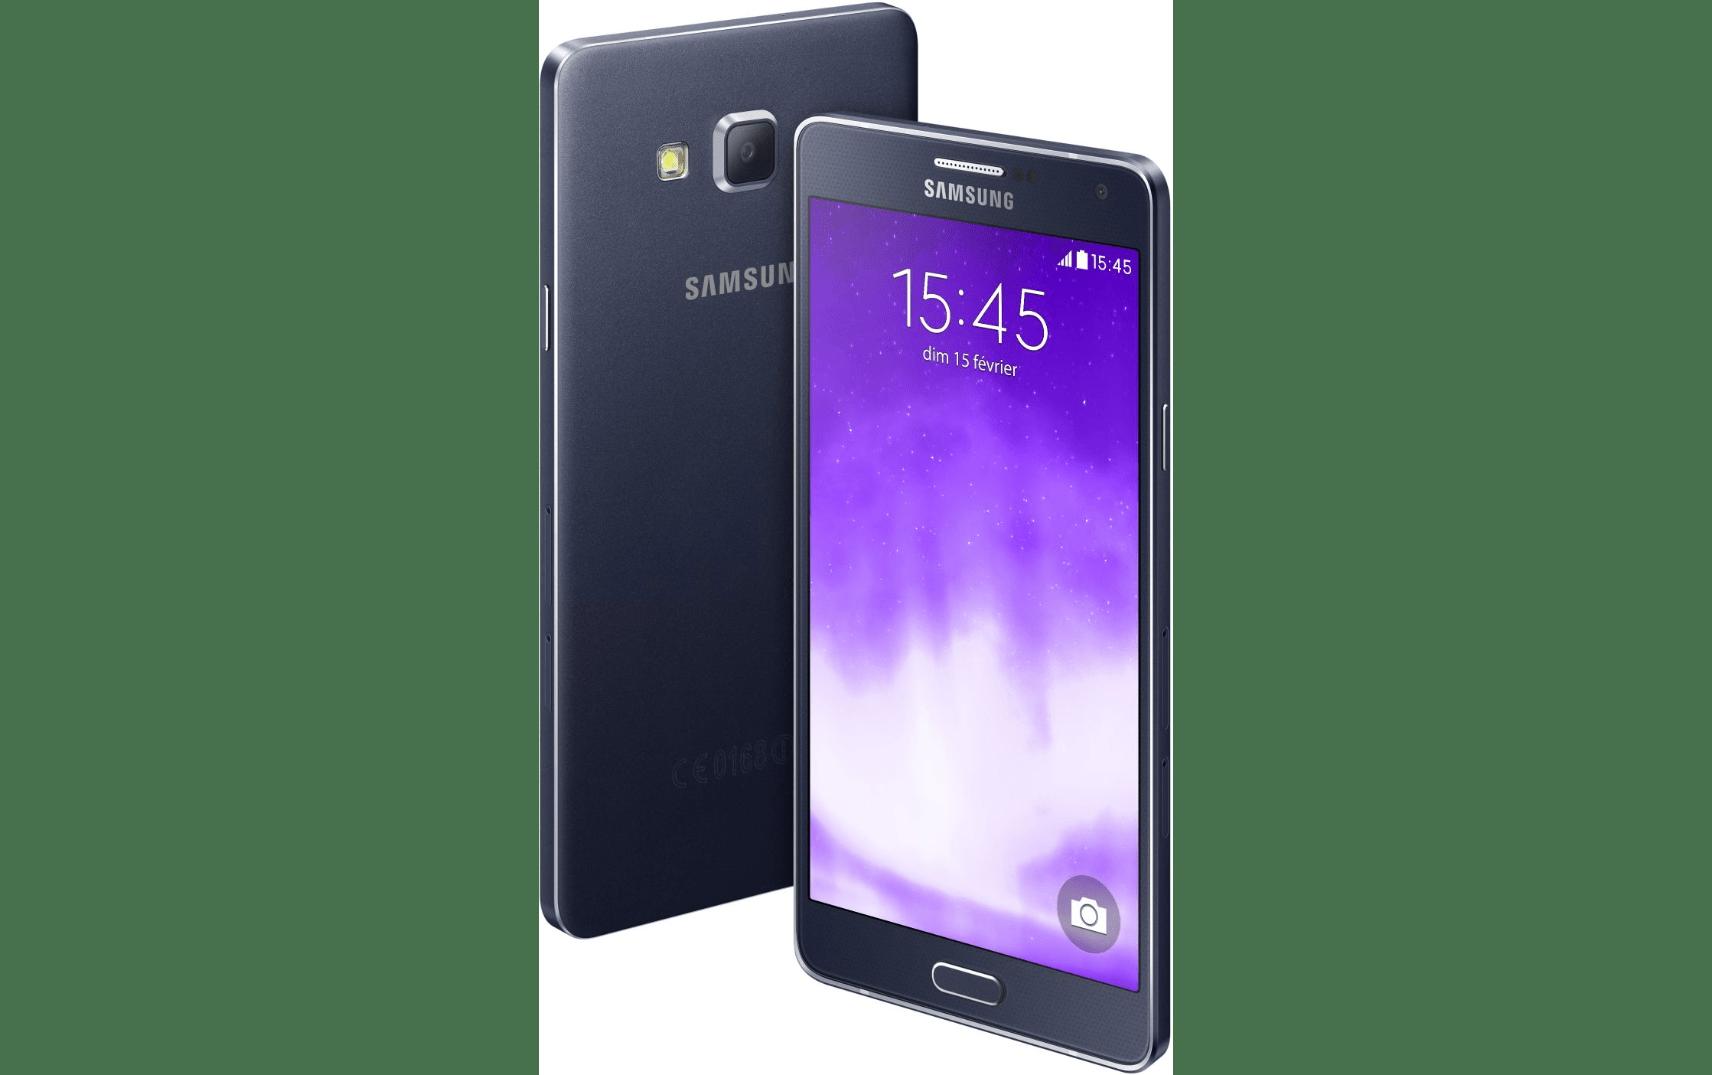 Samsung Galaxy A8 : un capteur d'empreintes digitales et une possible sortie en Europe